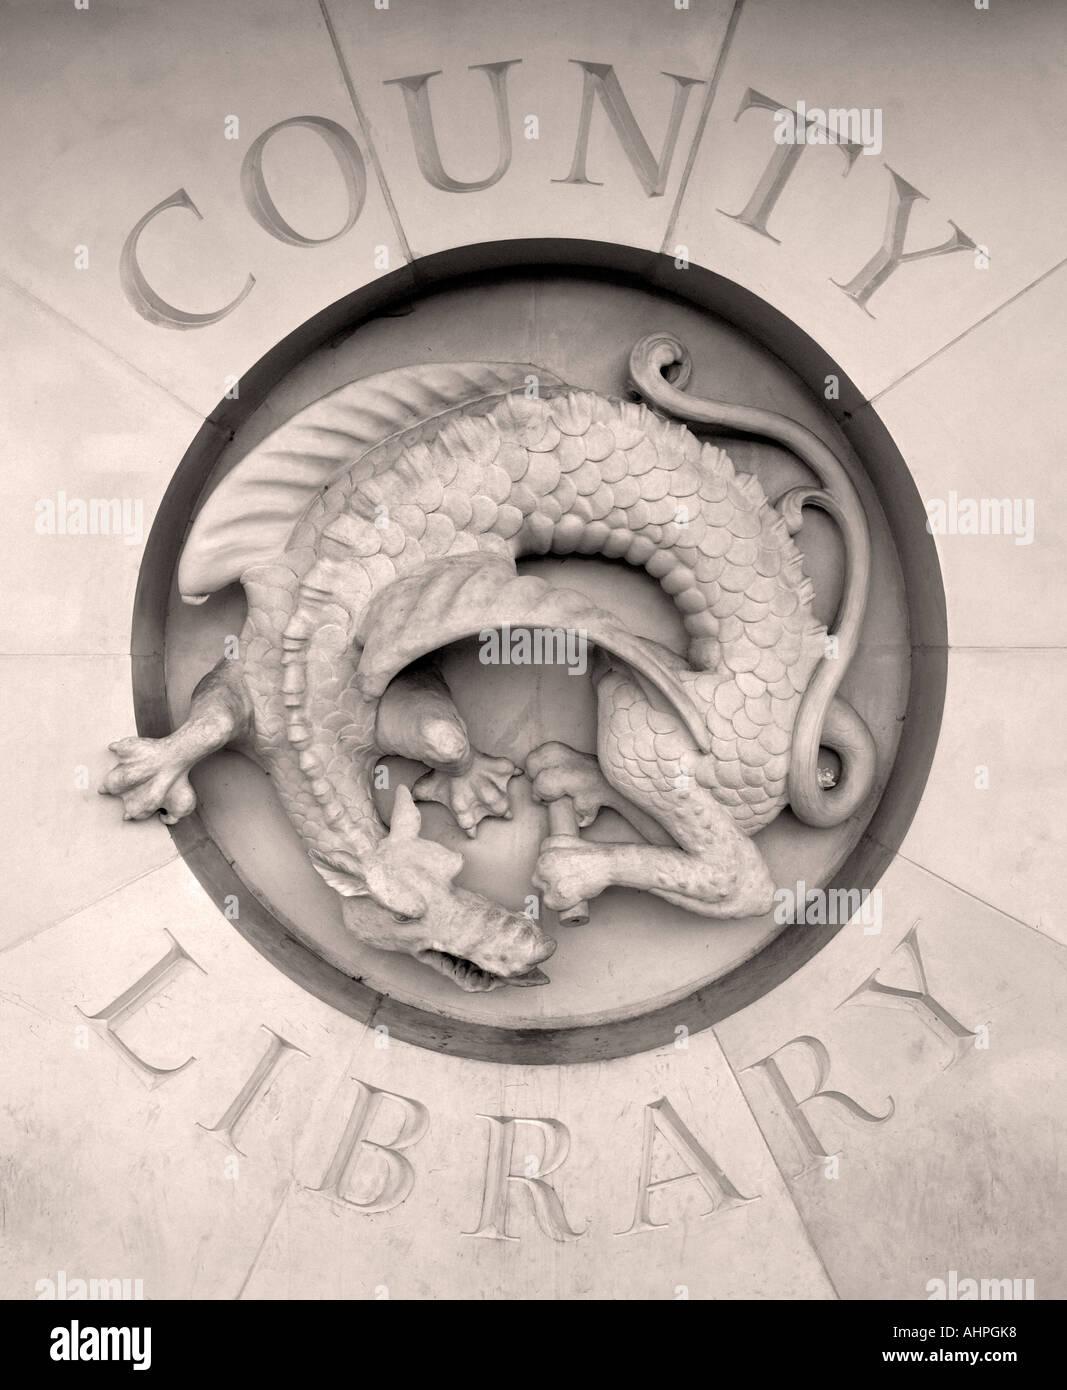 County Library, Taunton, Somerset, England - Stock Image